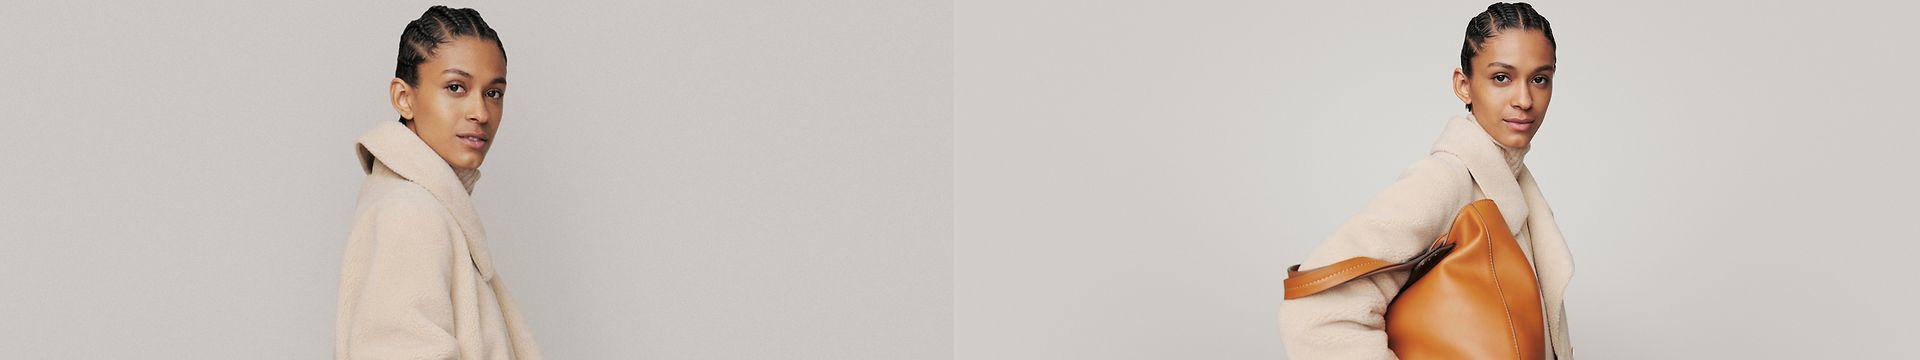 402021 - women - hero small - wool - outerwear guide - IMG